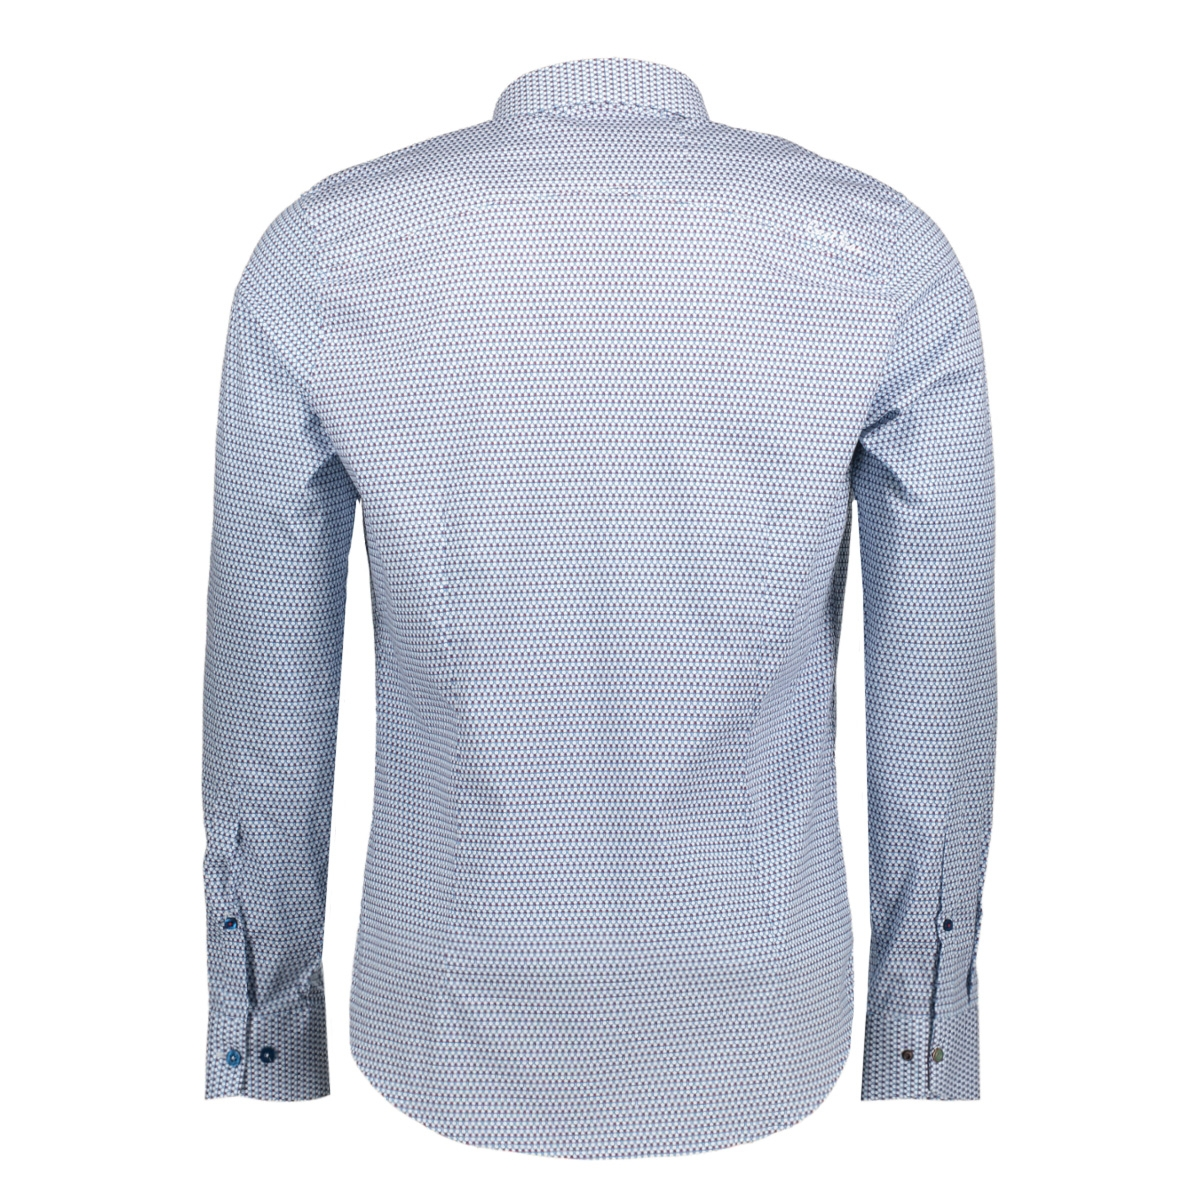 csi178604 cast iron overhemd 900